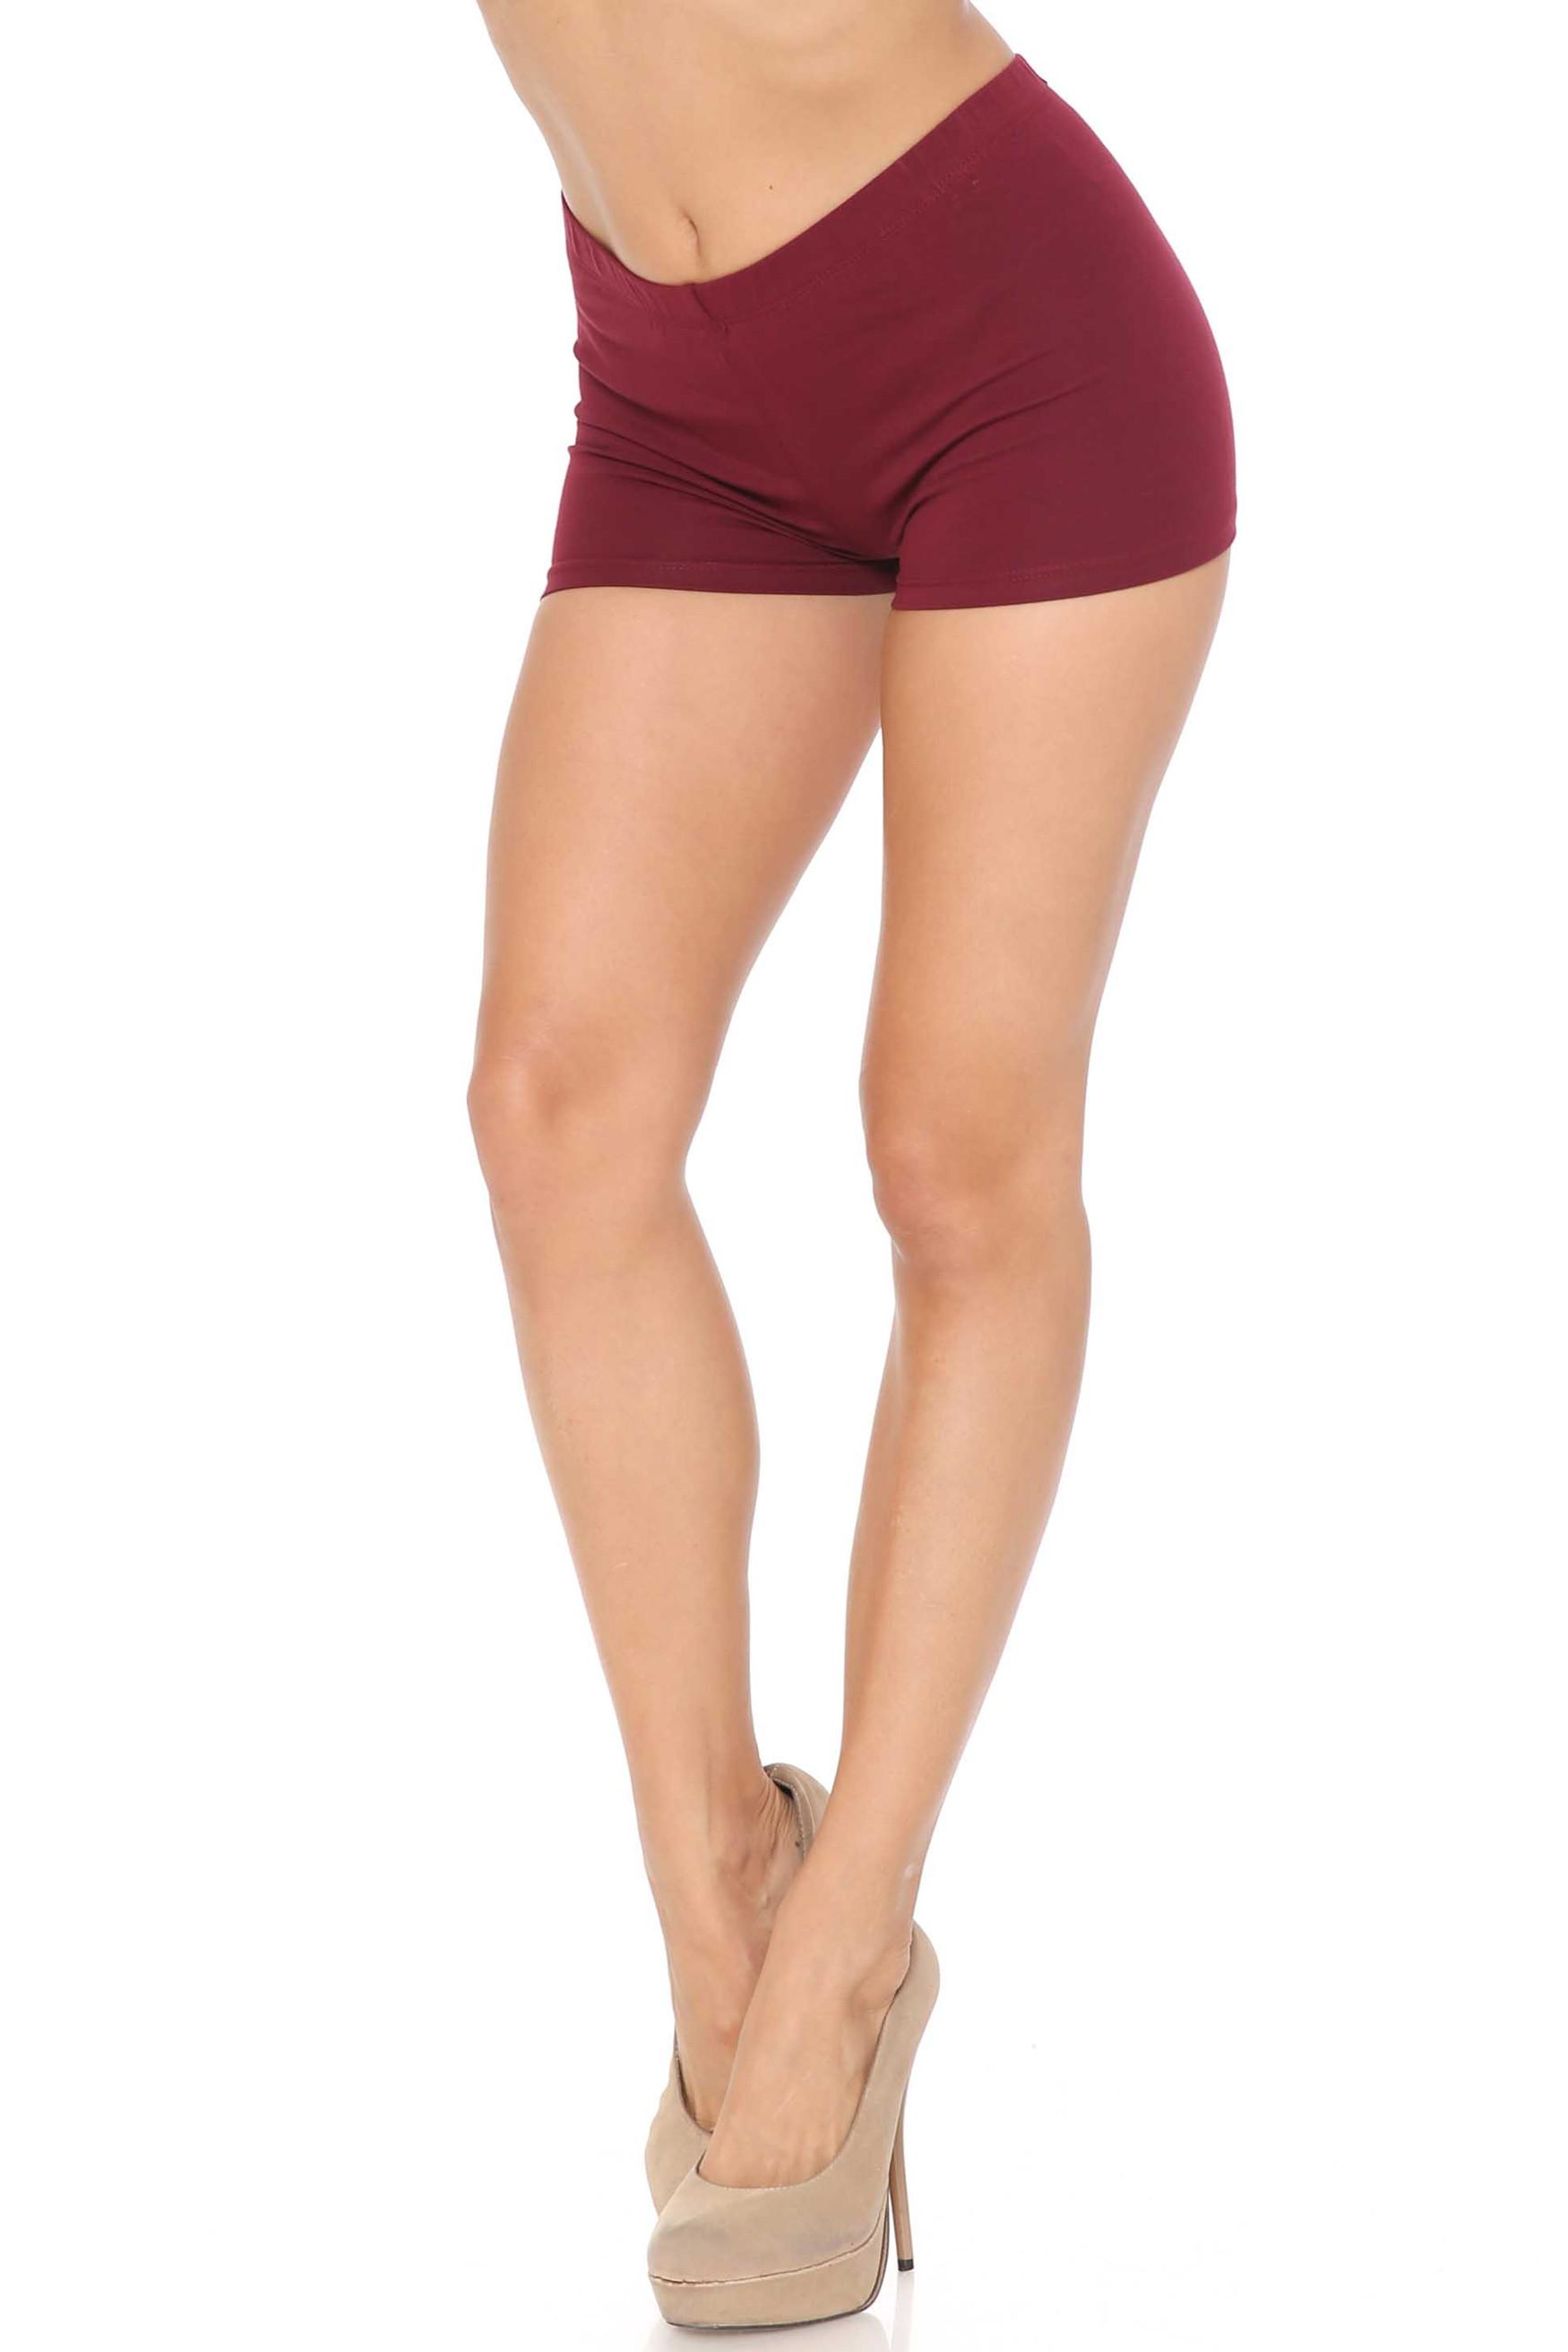 Burgundy USA Cotton Boy Shorts